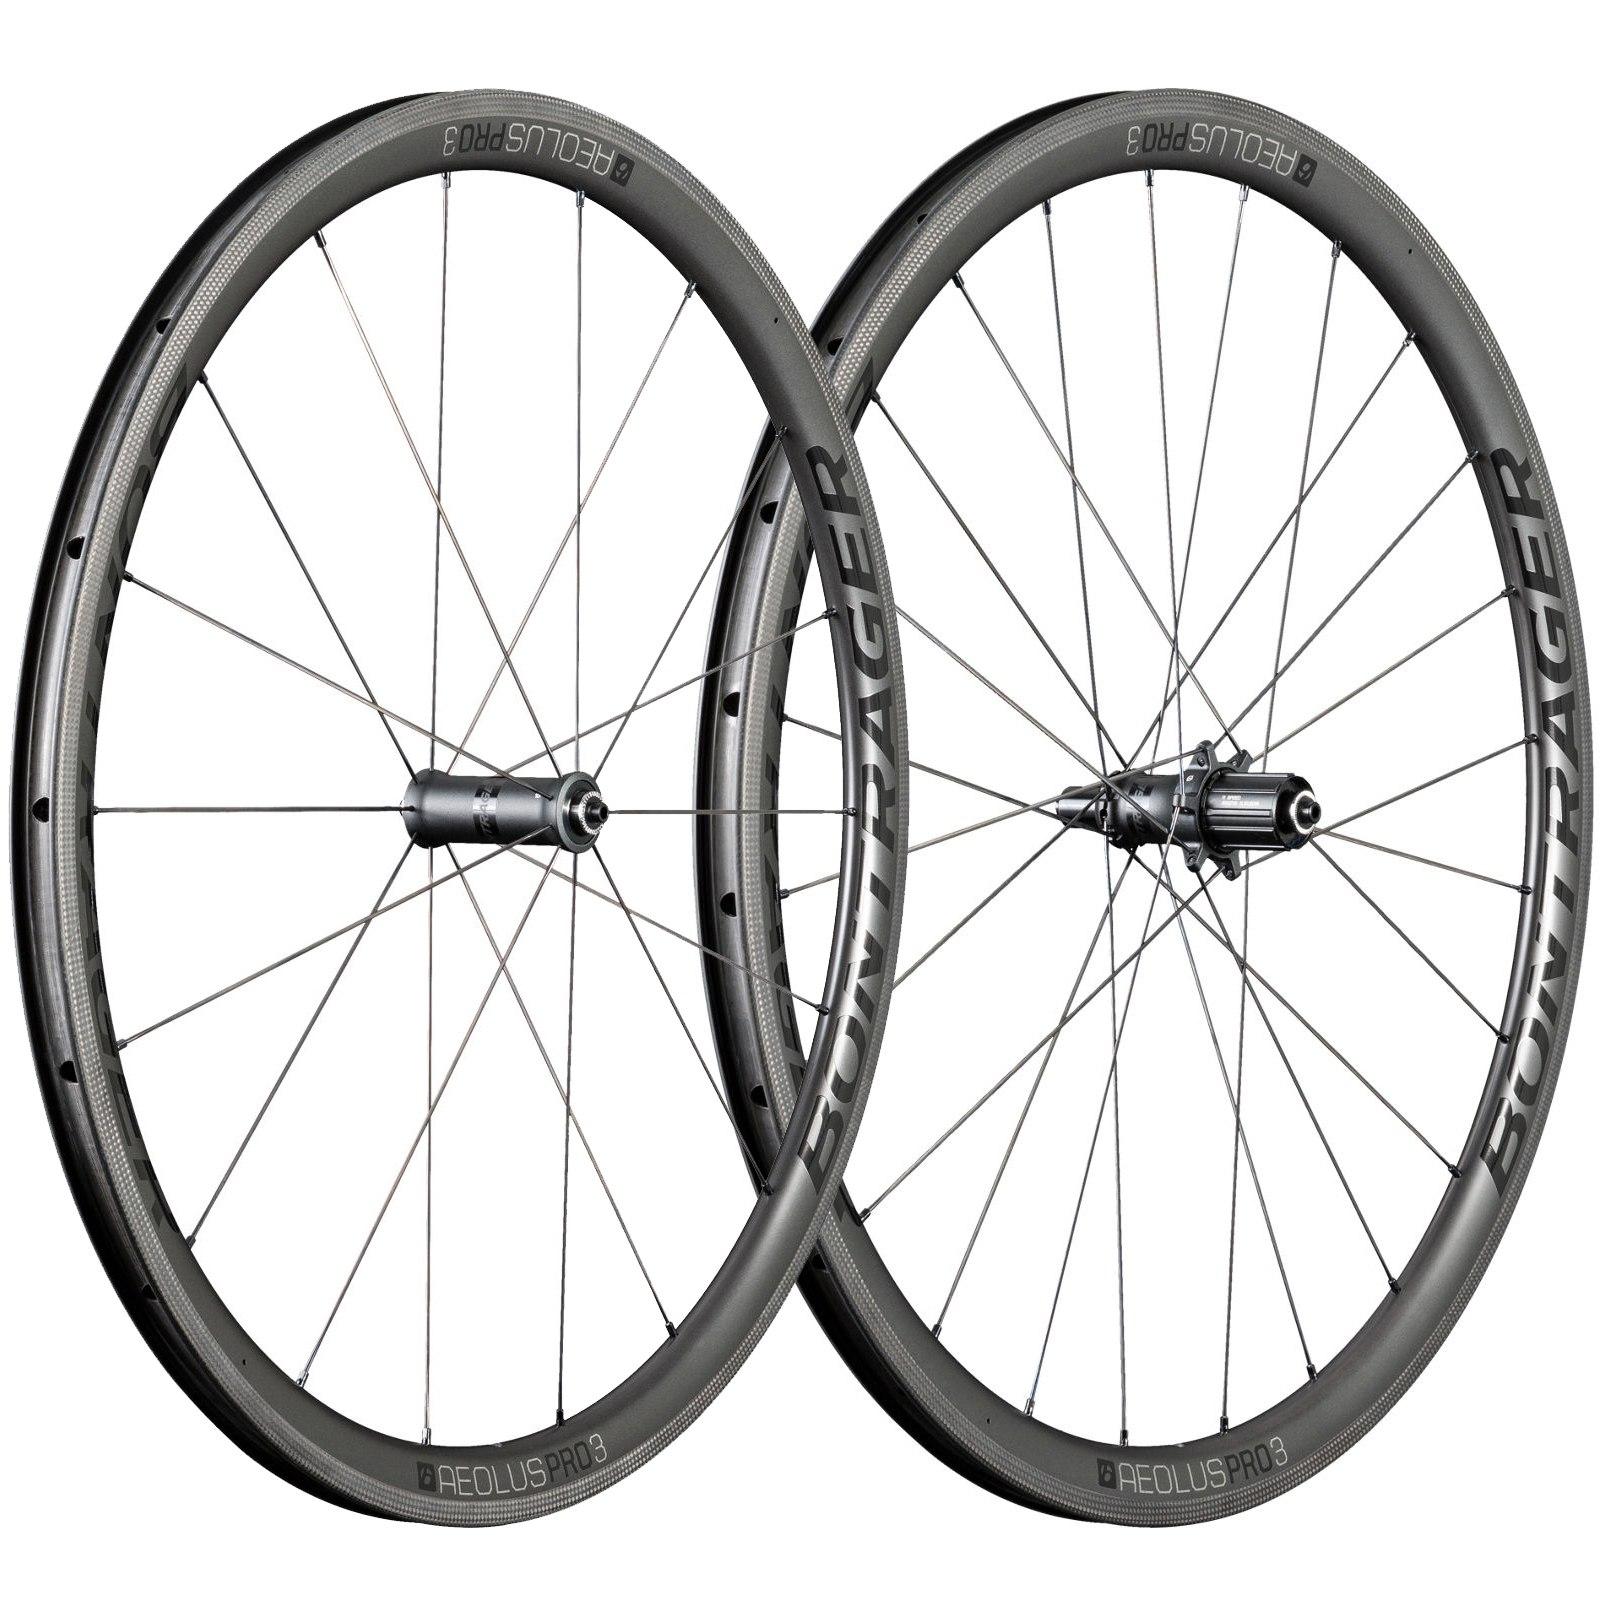 Bontrager Aeolus Pro 3 TLR Road Wheelset - Clincher - FW: 100mm/QR   RW: 130mm/QR